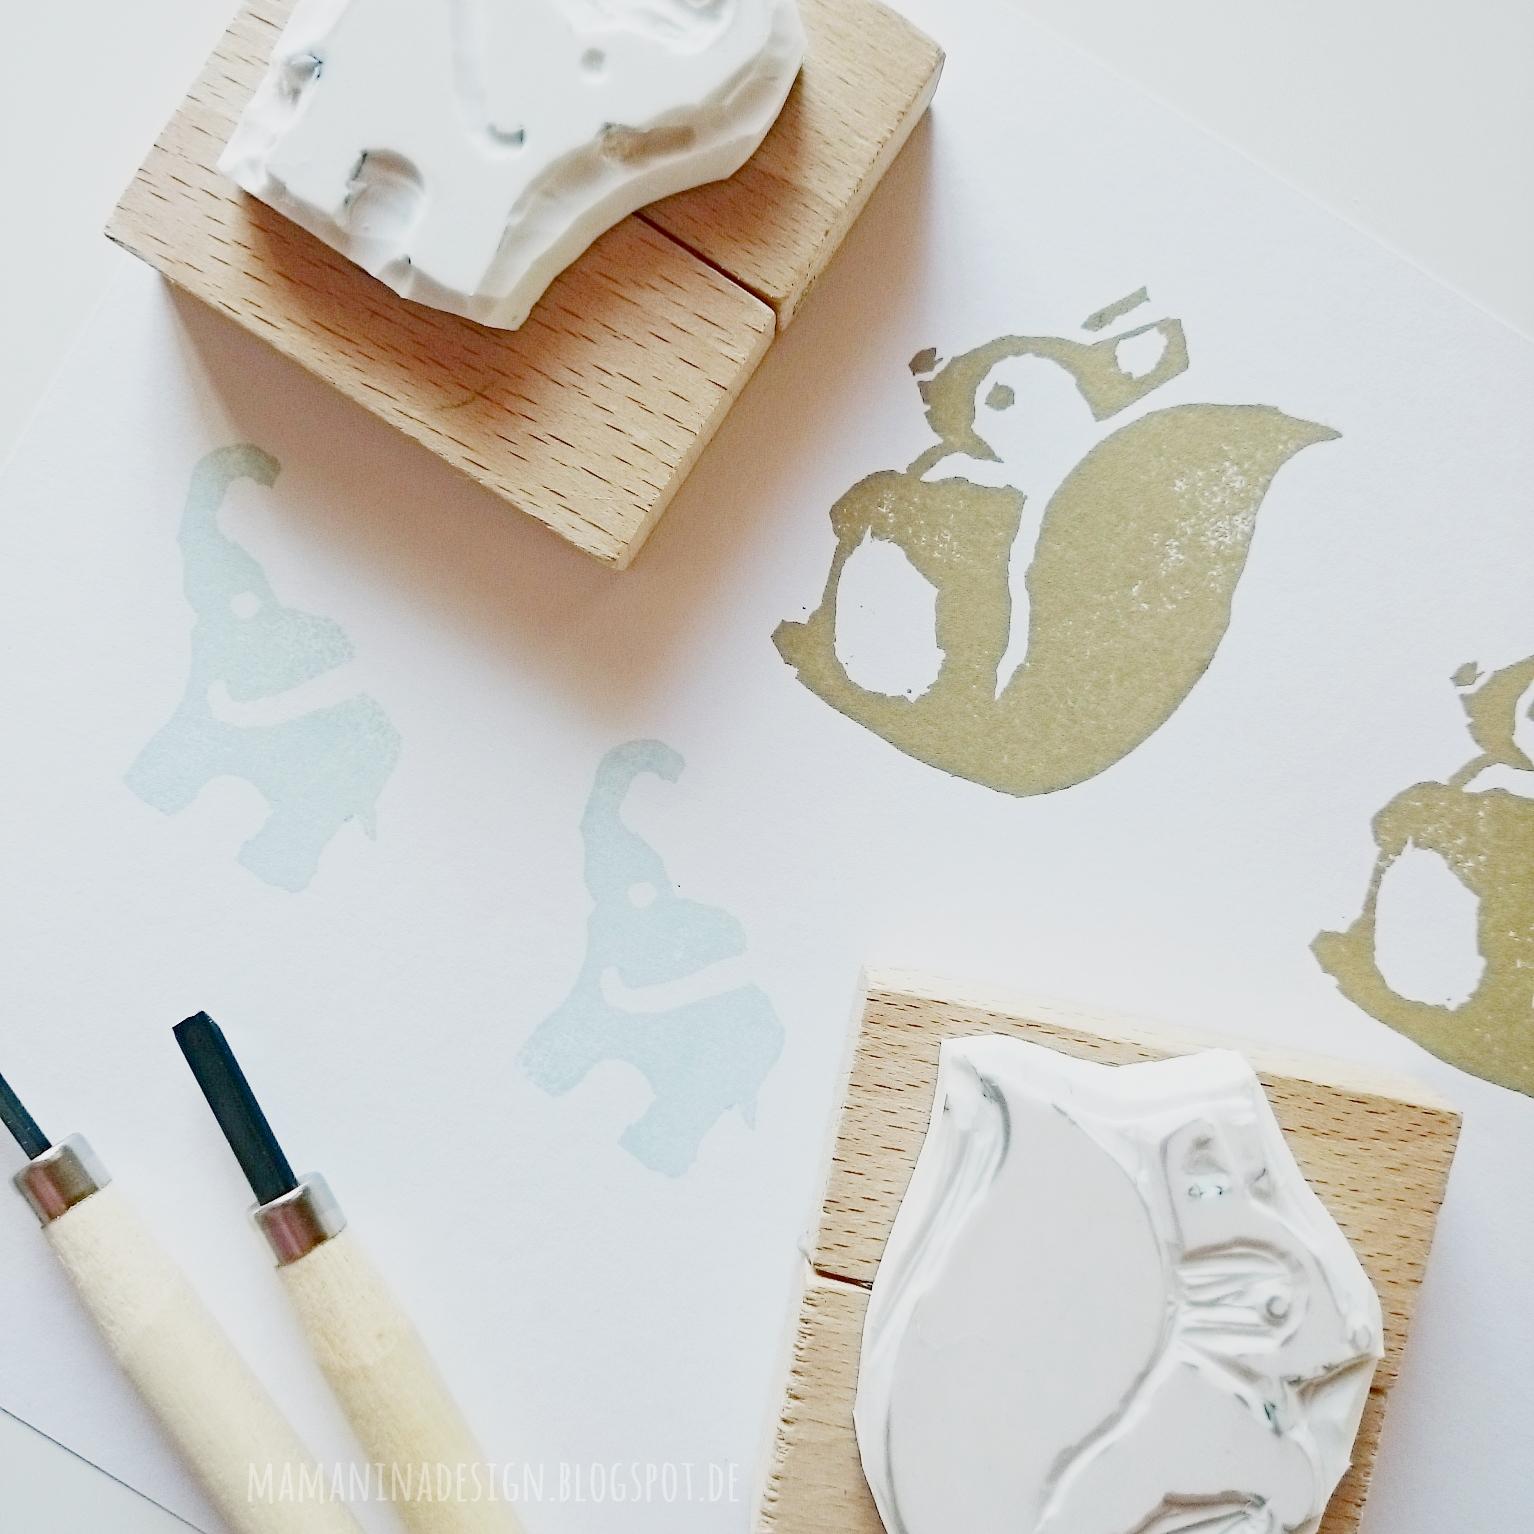 mama nina stempel selber machen ein buchtipp. Black Bedroom Furniture Sets. Home Design Ideas